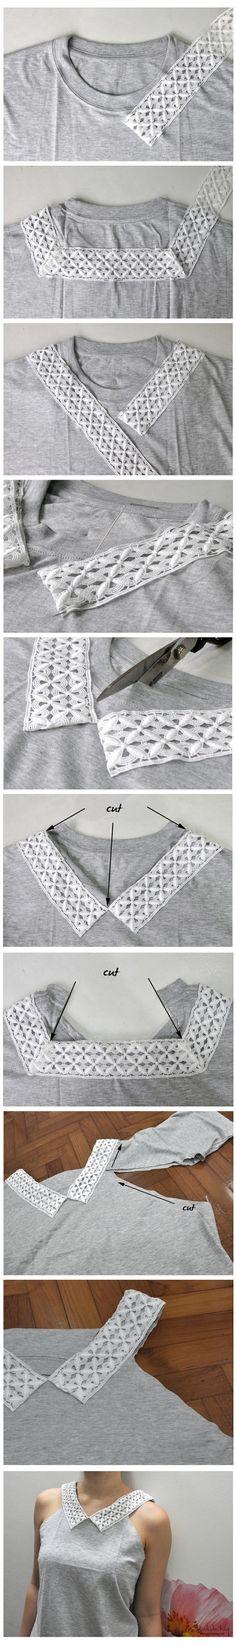 DIY T shirt by alice29